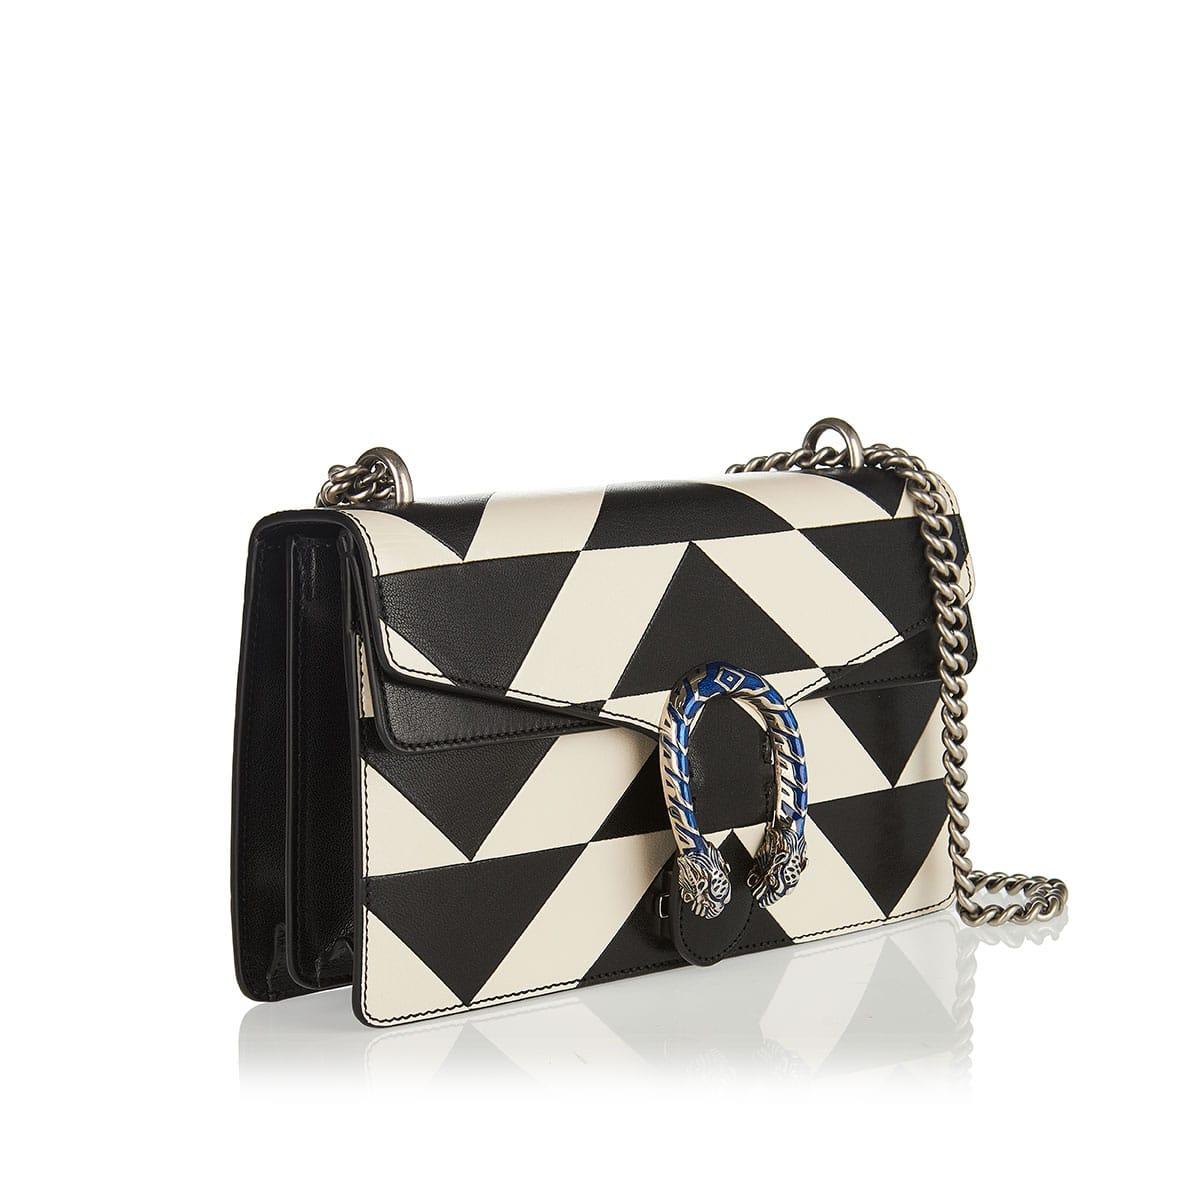 Dionysus small geometric patterned bag